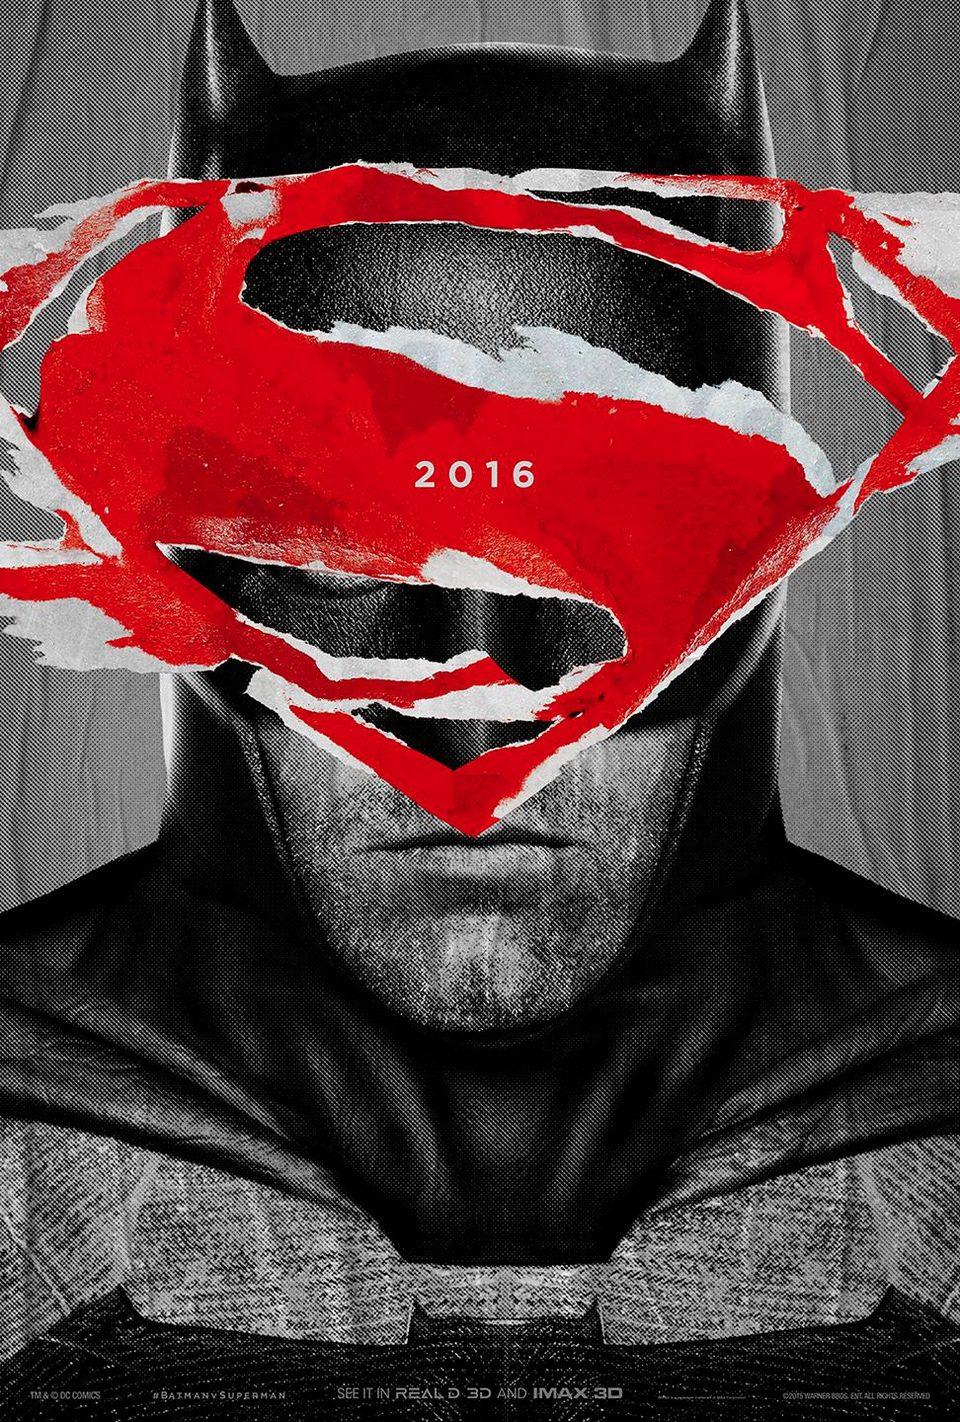 IMAX 2 poster for Batman v Superman: Dawn of Justice